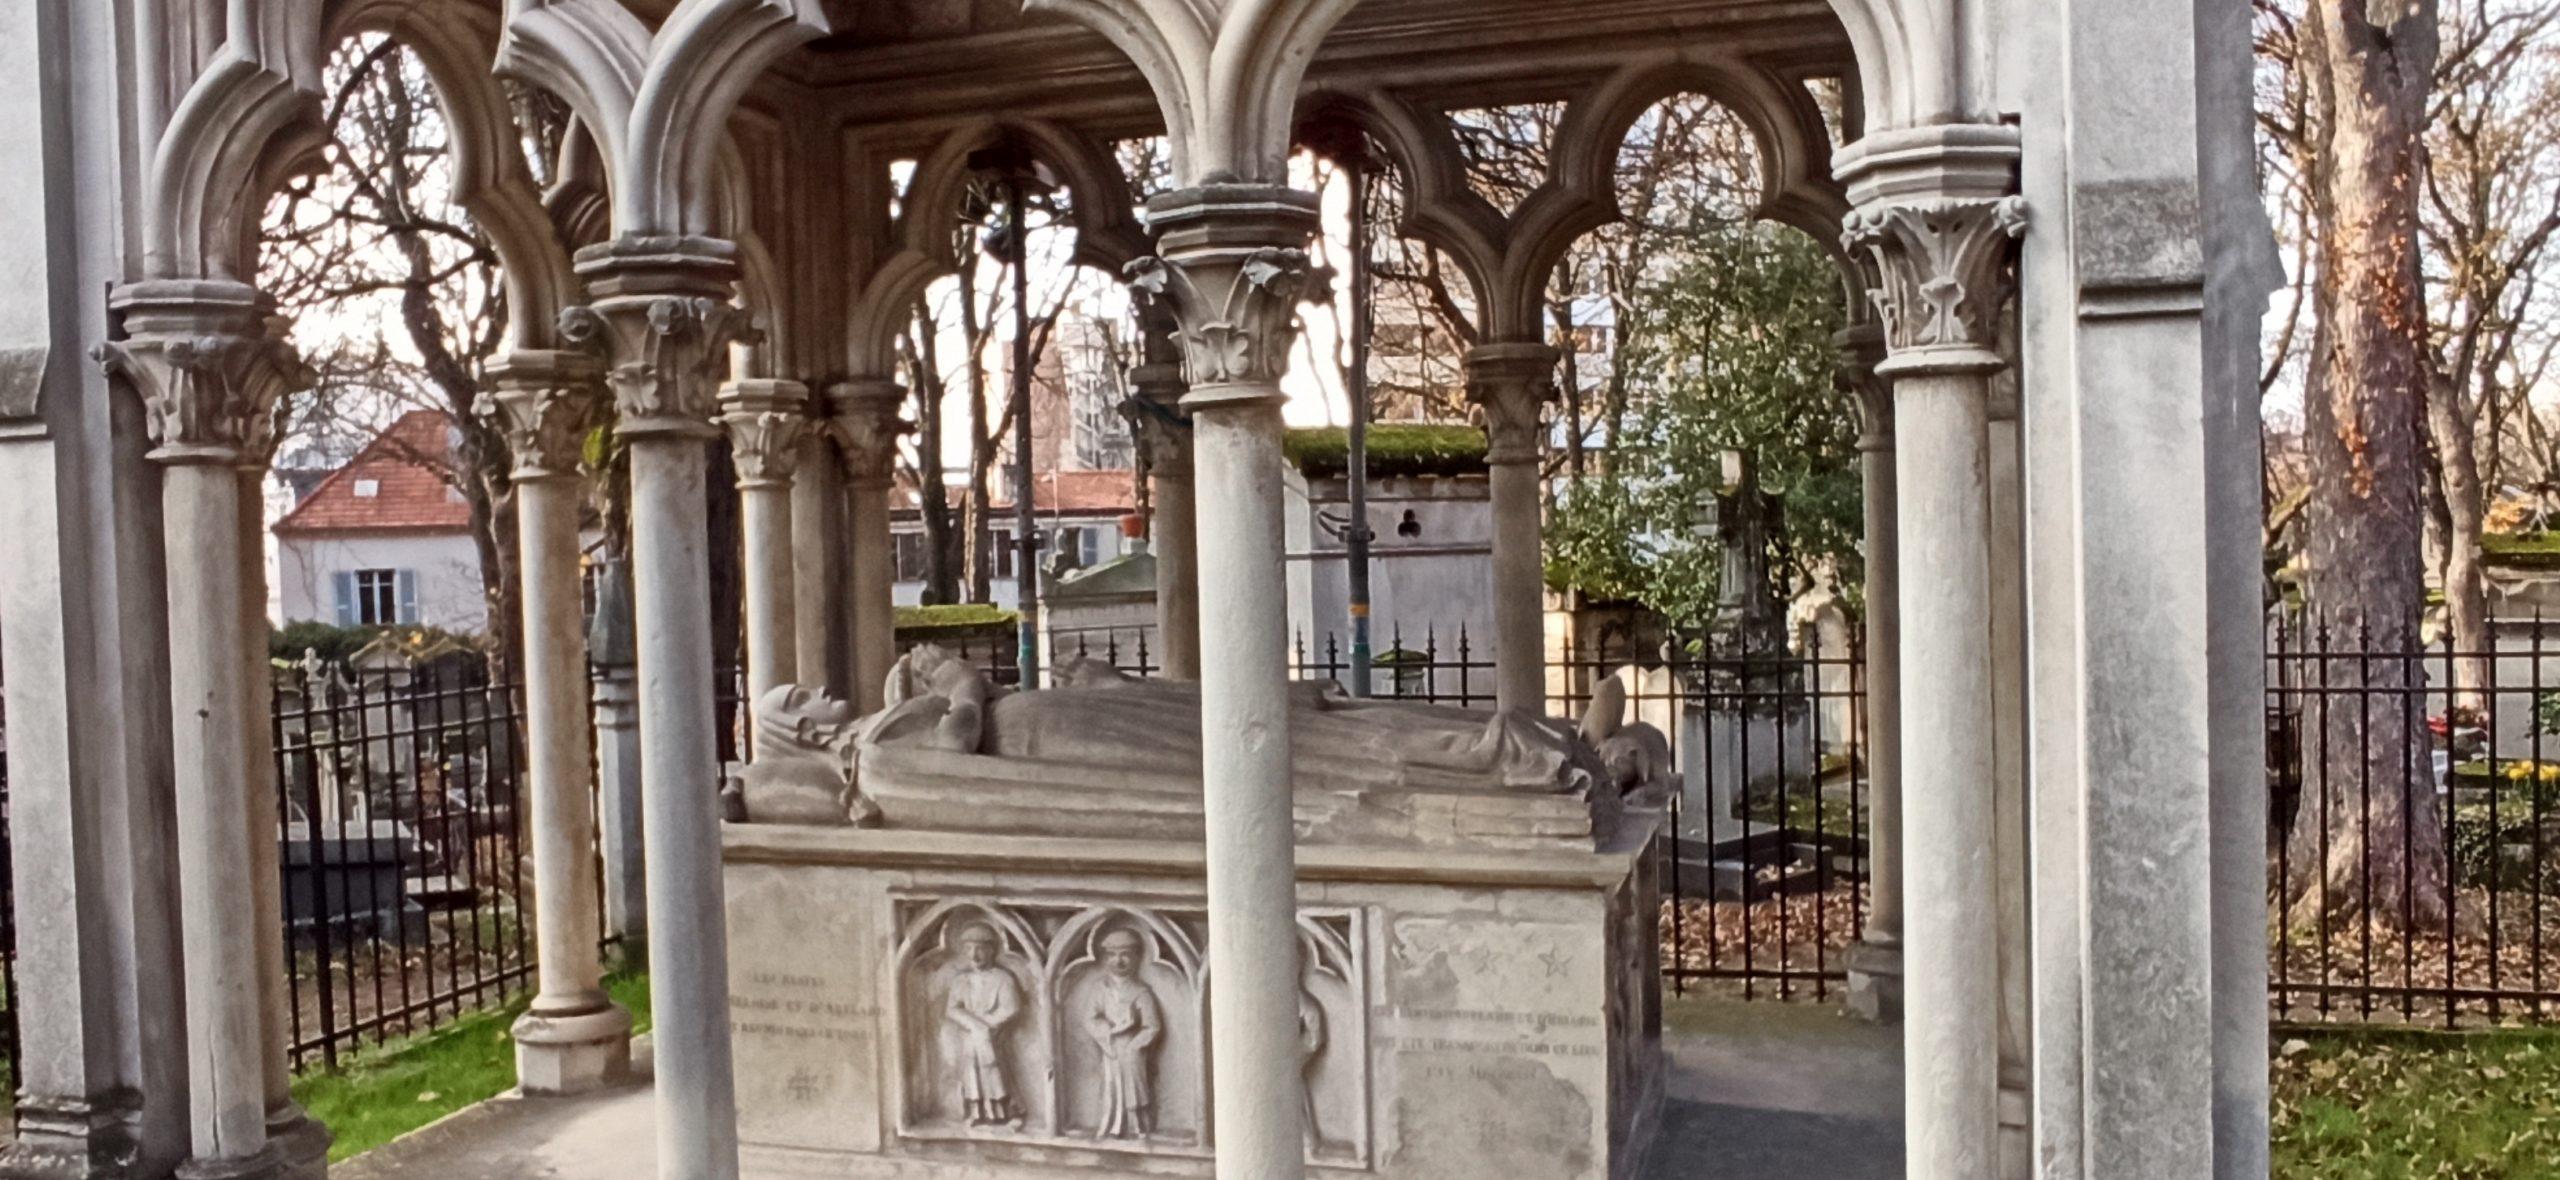 Абеляр и Элоиза - кладбище Пер Лашез в Париже